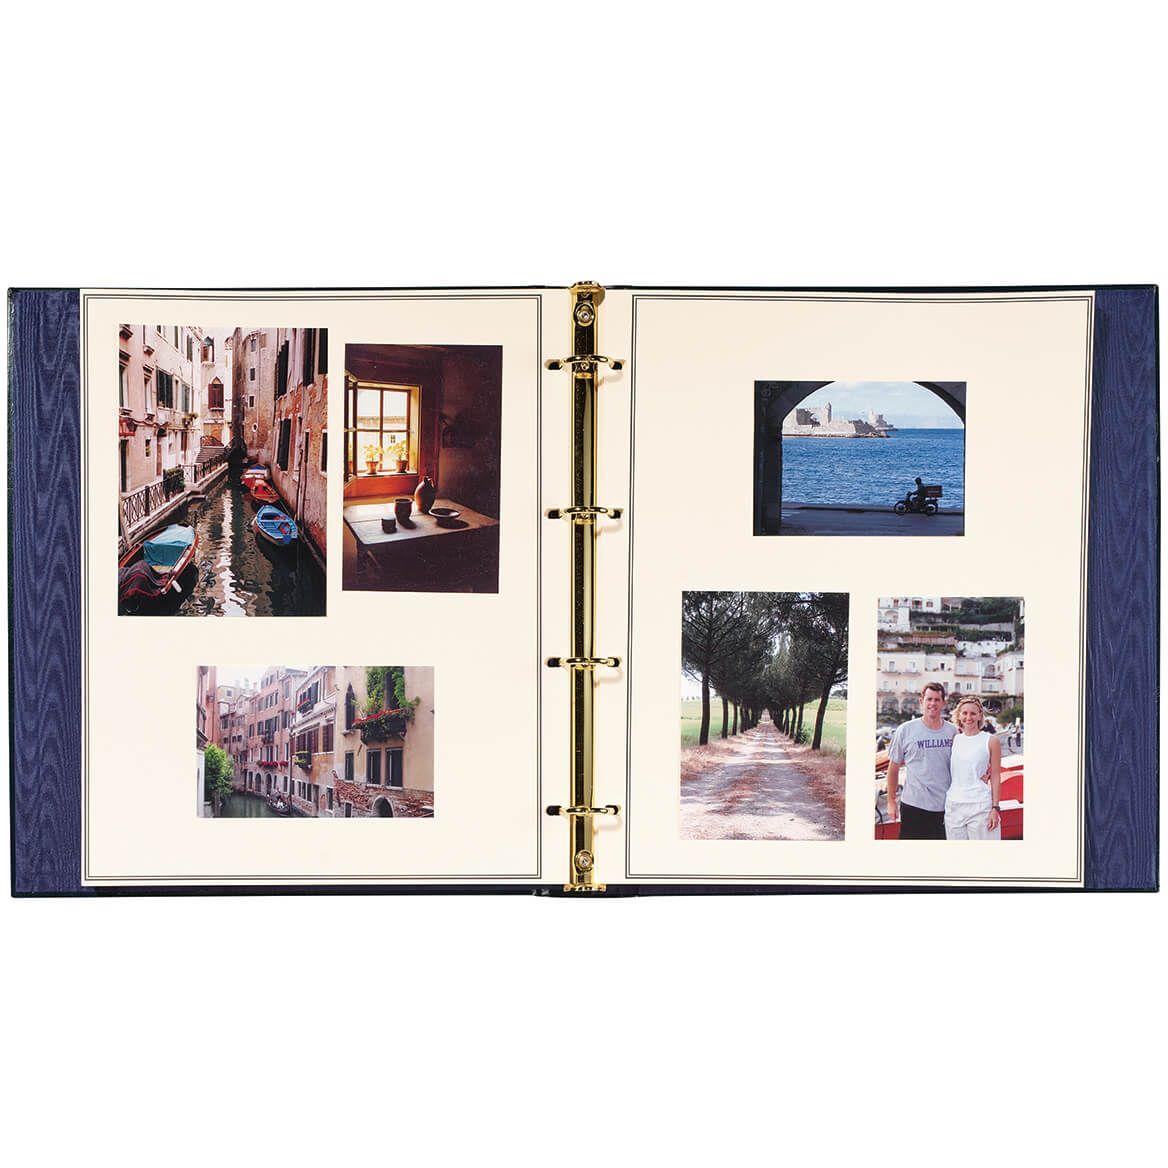 Personalized Presidential Oversize Album-309257